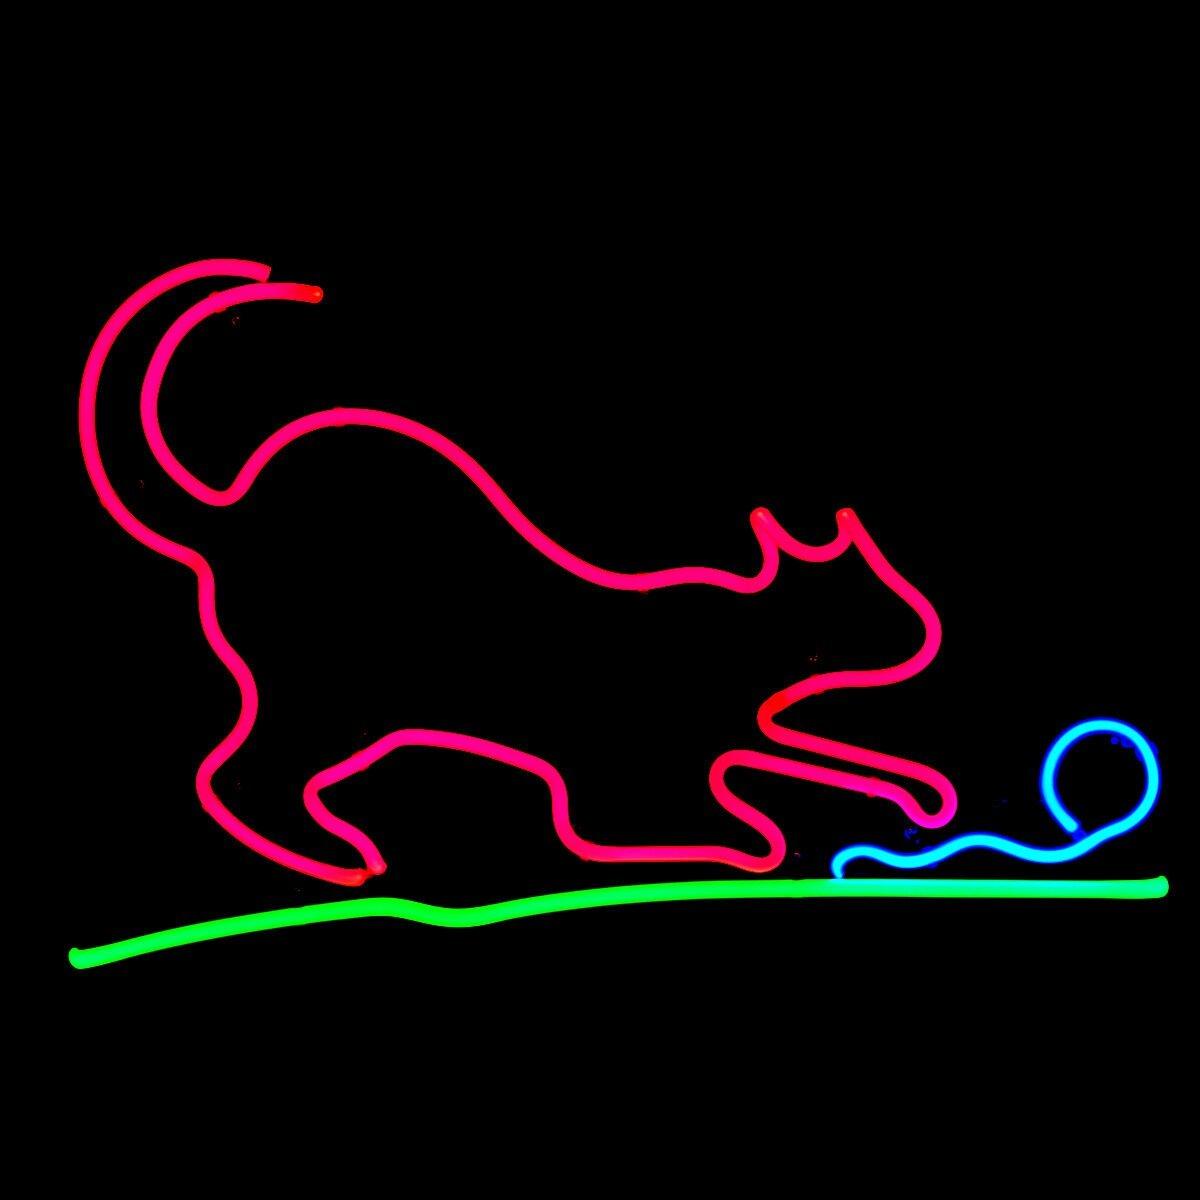 GIFT FOR CAT OWNERS - CAT NEON LIGHT ARTWORK by John Barton - BartonNeonMagic.com